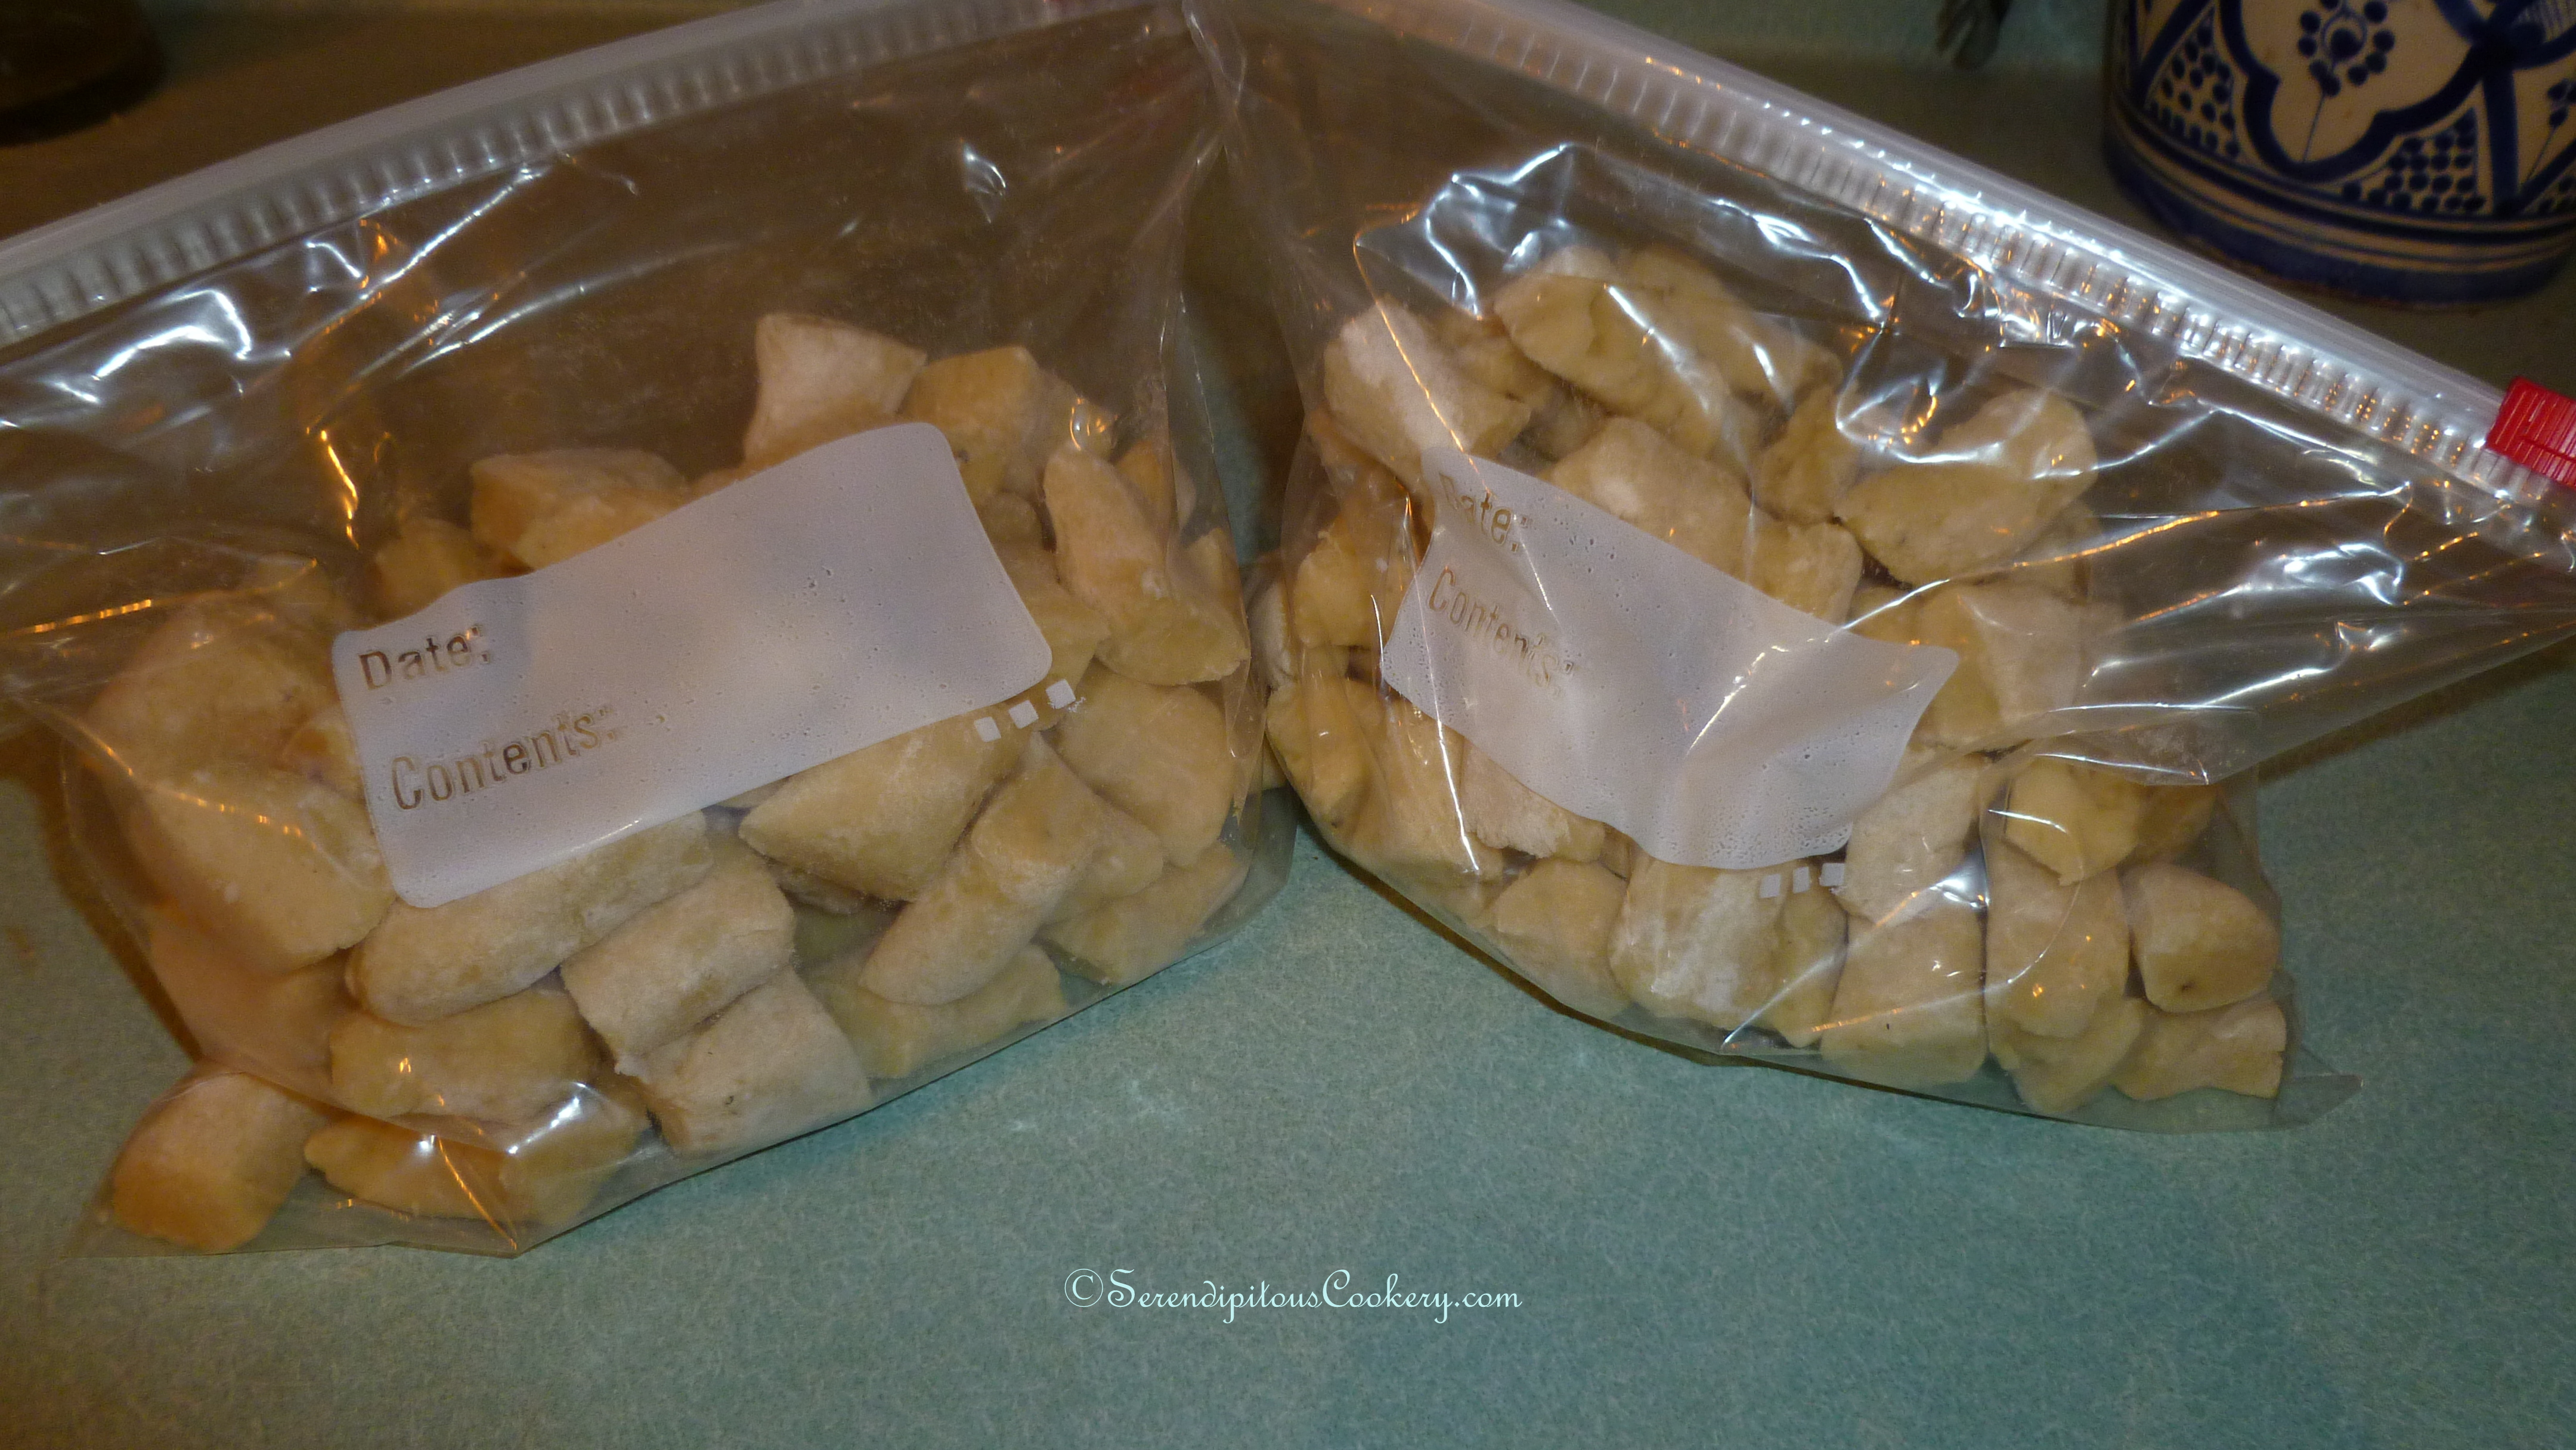 Gnocchi Con Bolognese ~ Italian Comfort Food | Serendipitous Cookery